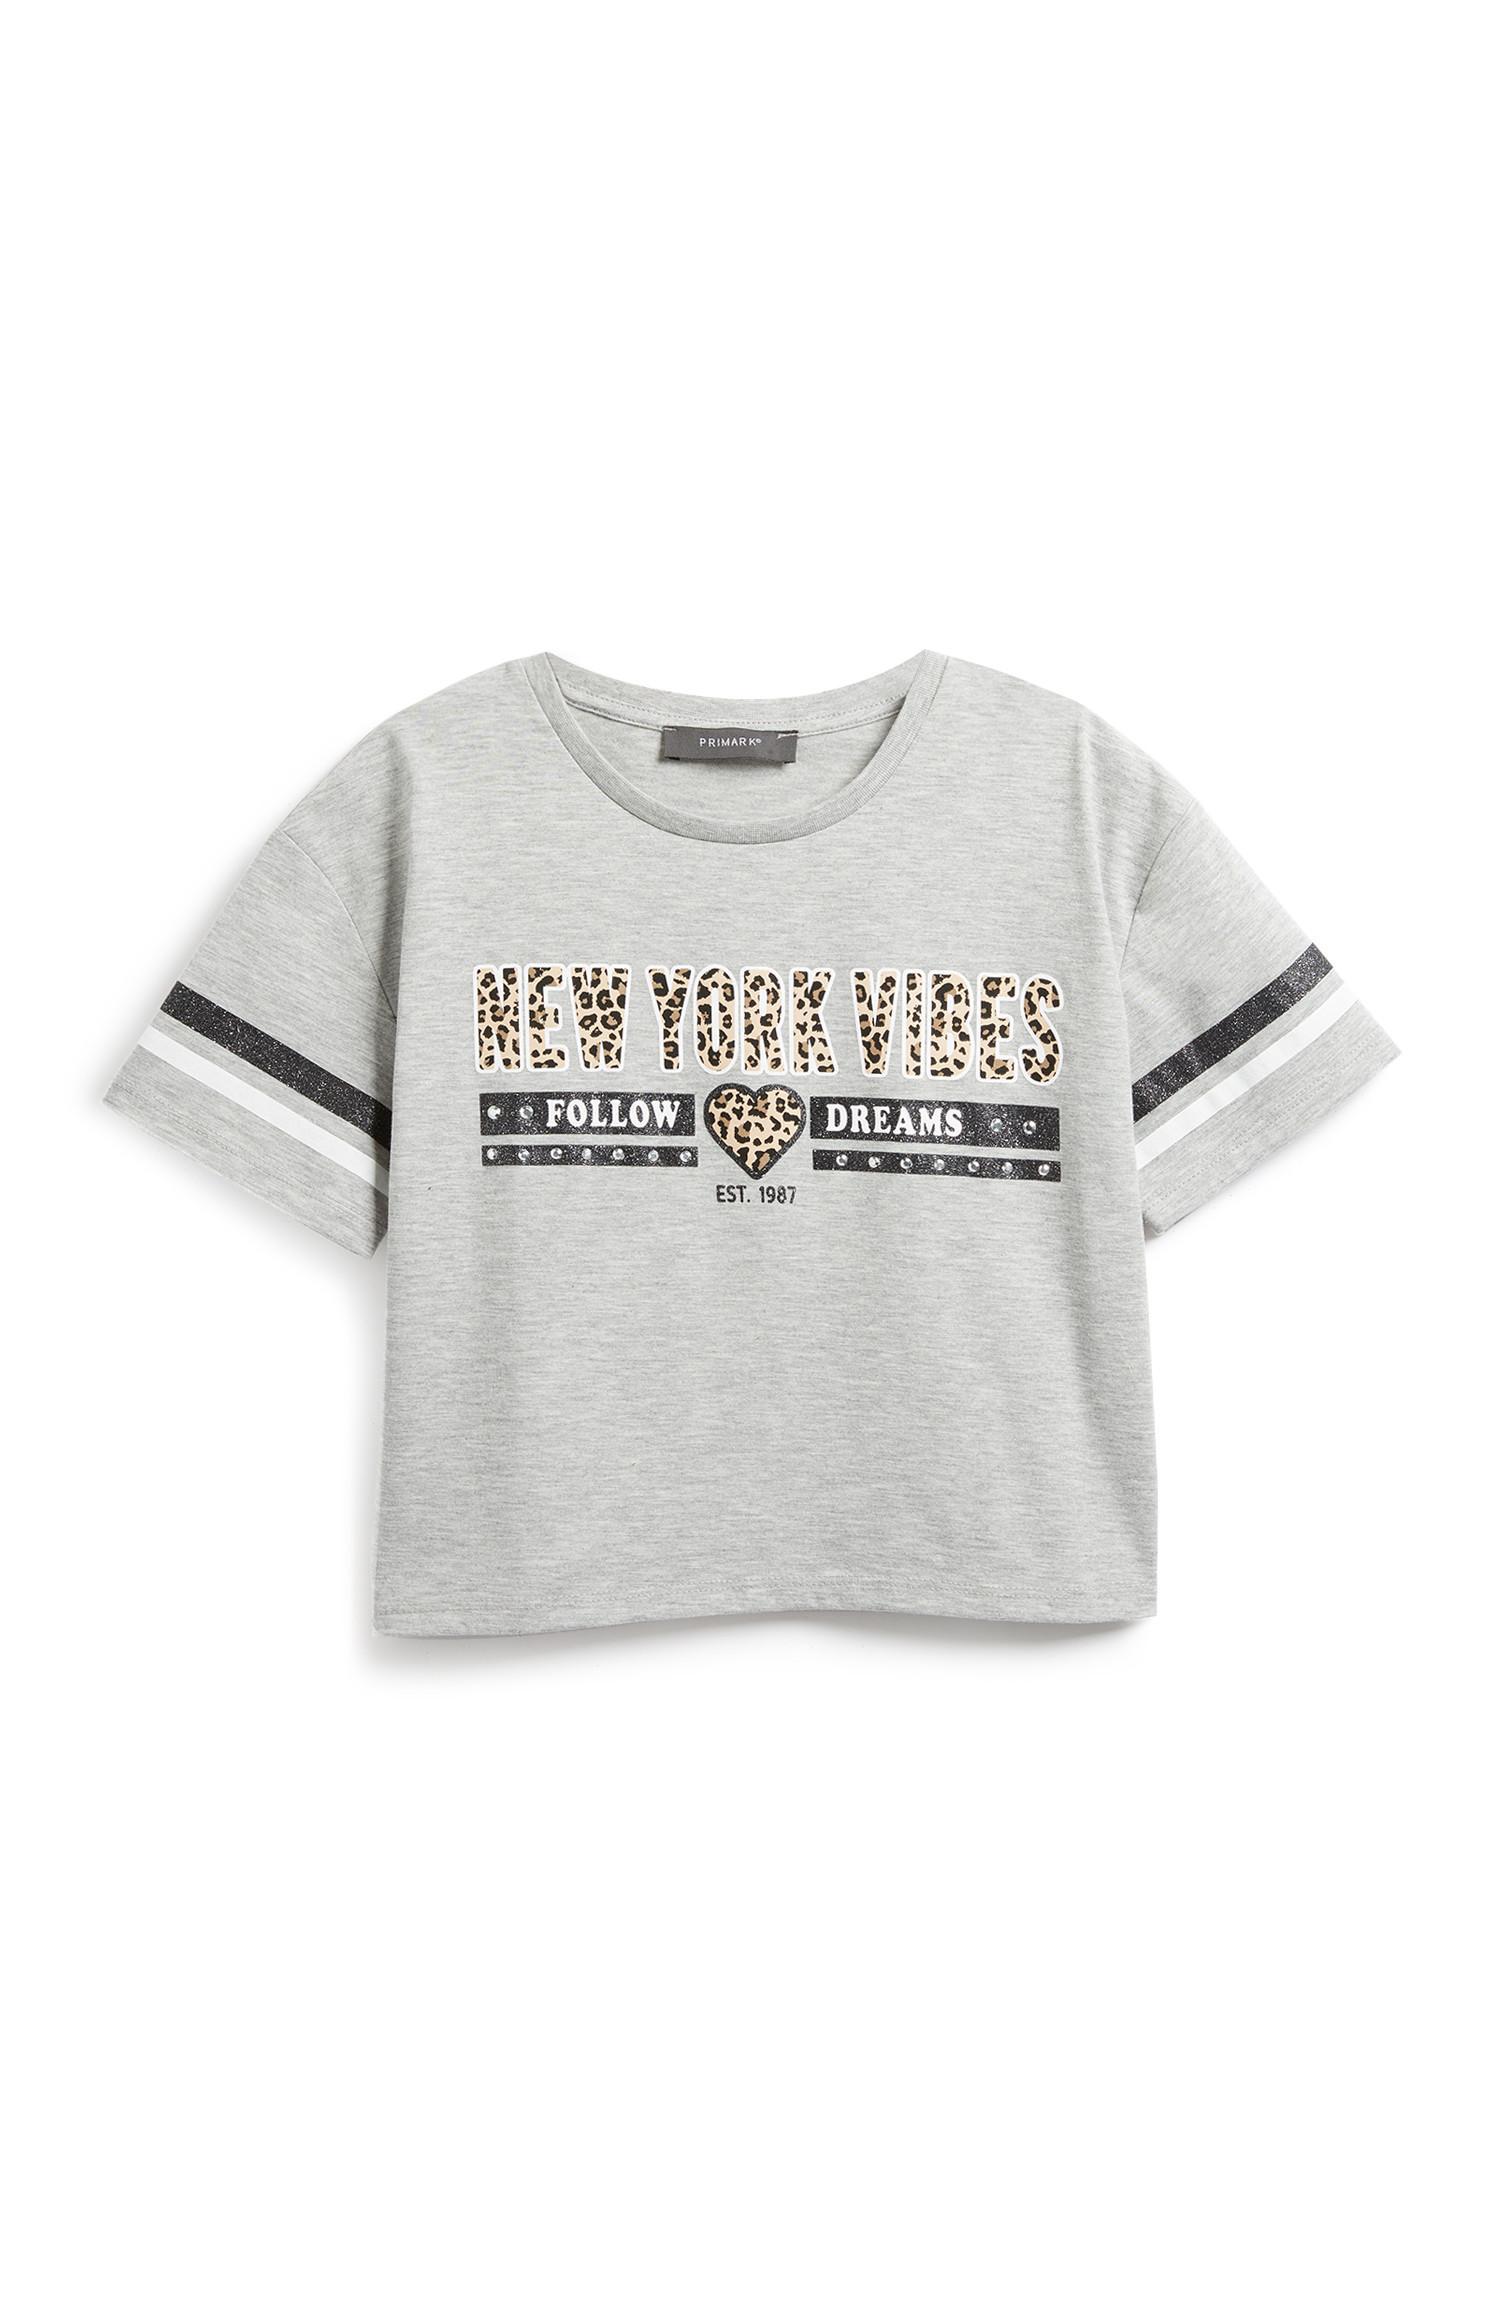 Older Girl NY T-Shirt